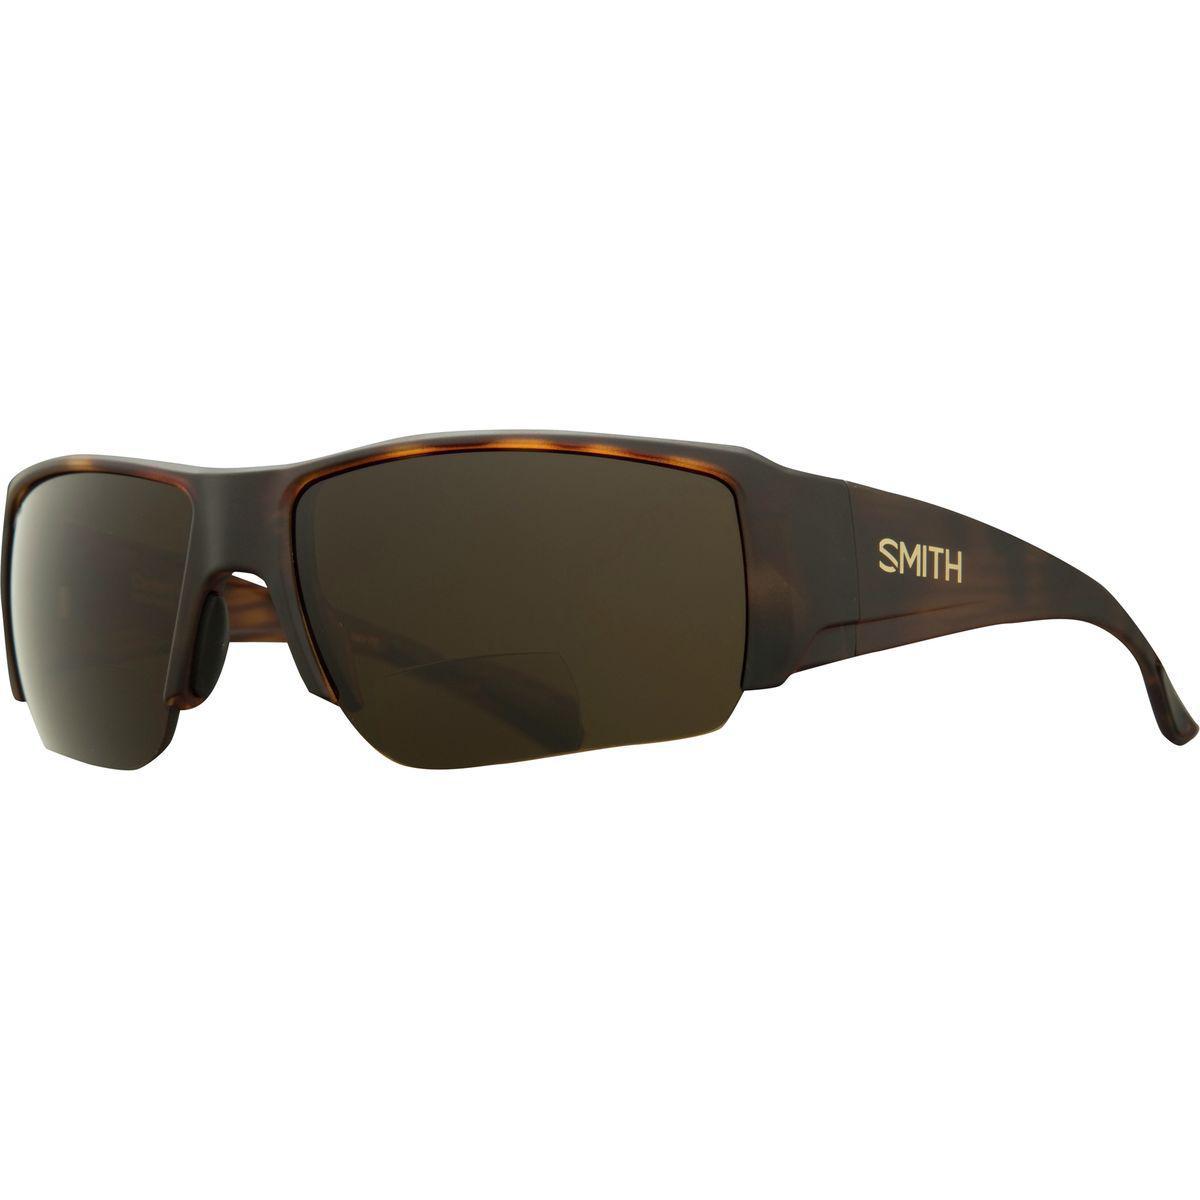 3eca3d3f213b2 Lyst - Smith Captains Choice Bifocal Polarized Sunglasses in Brown ...